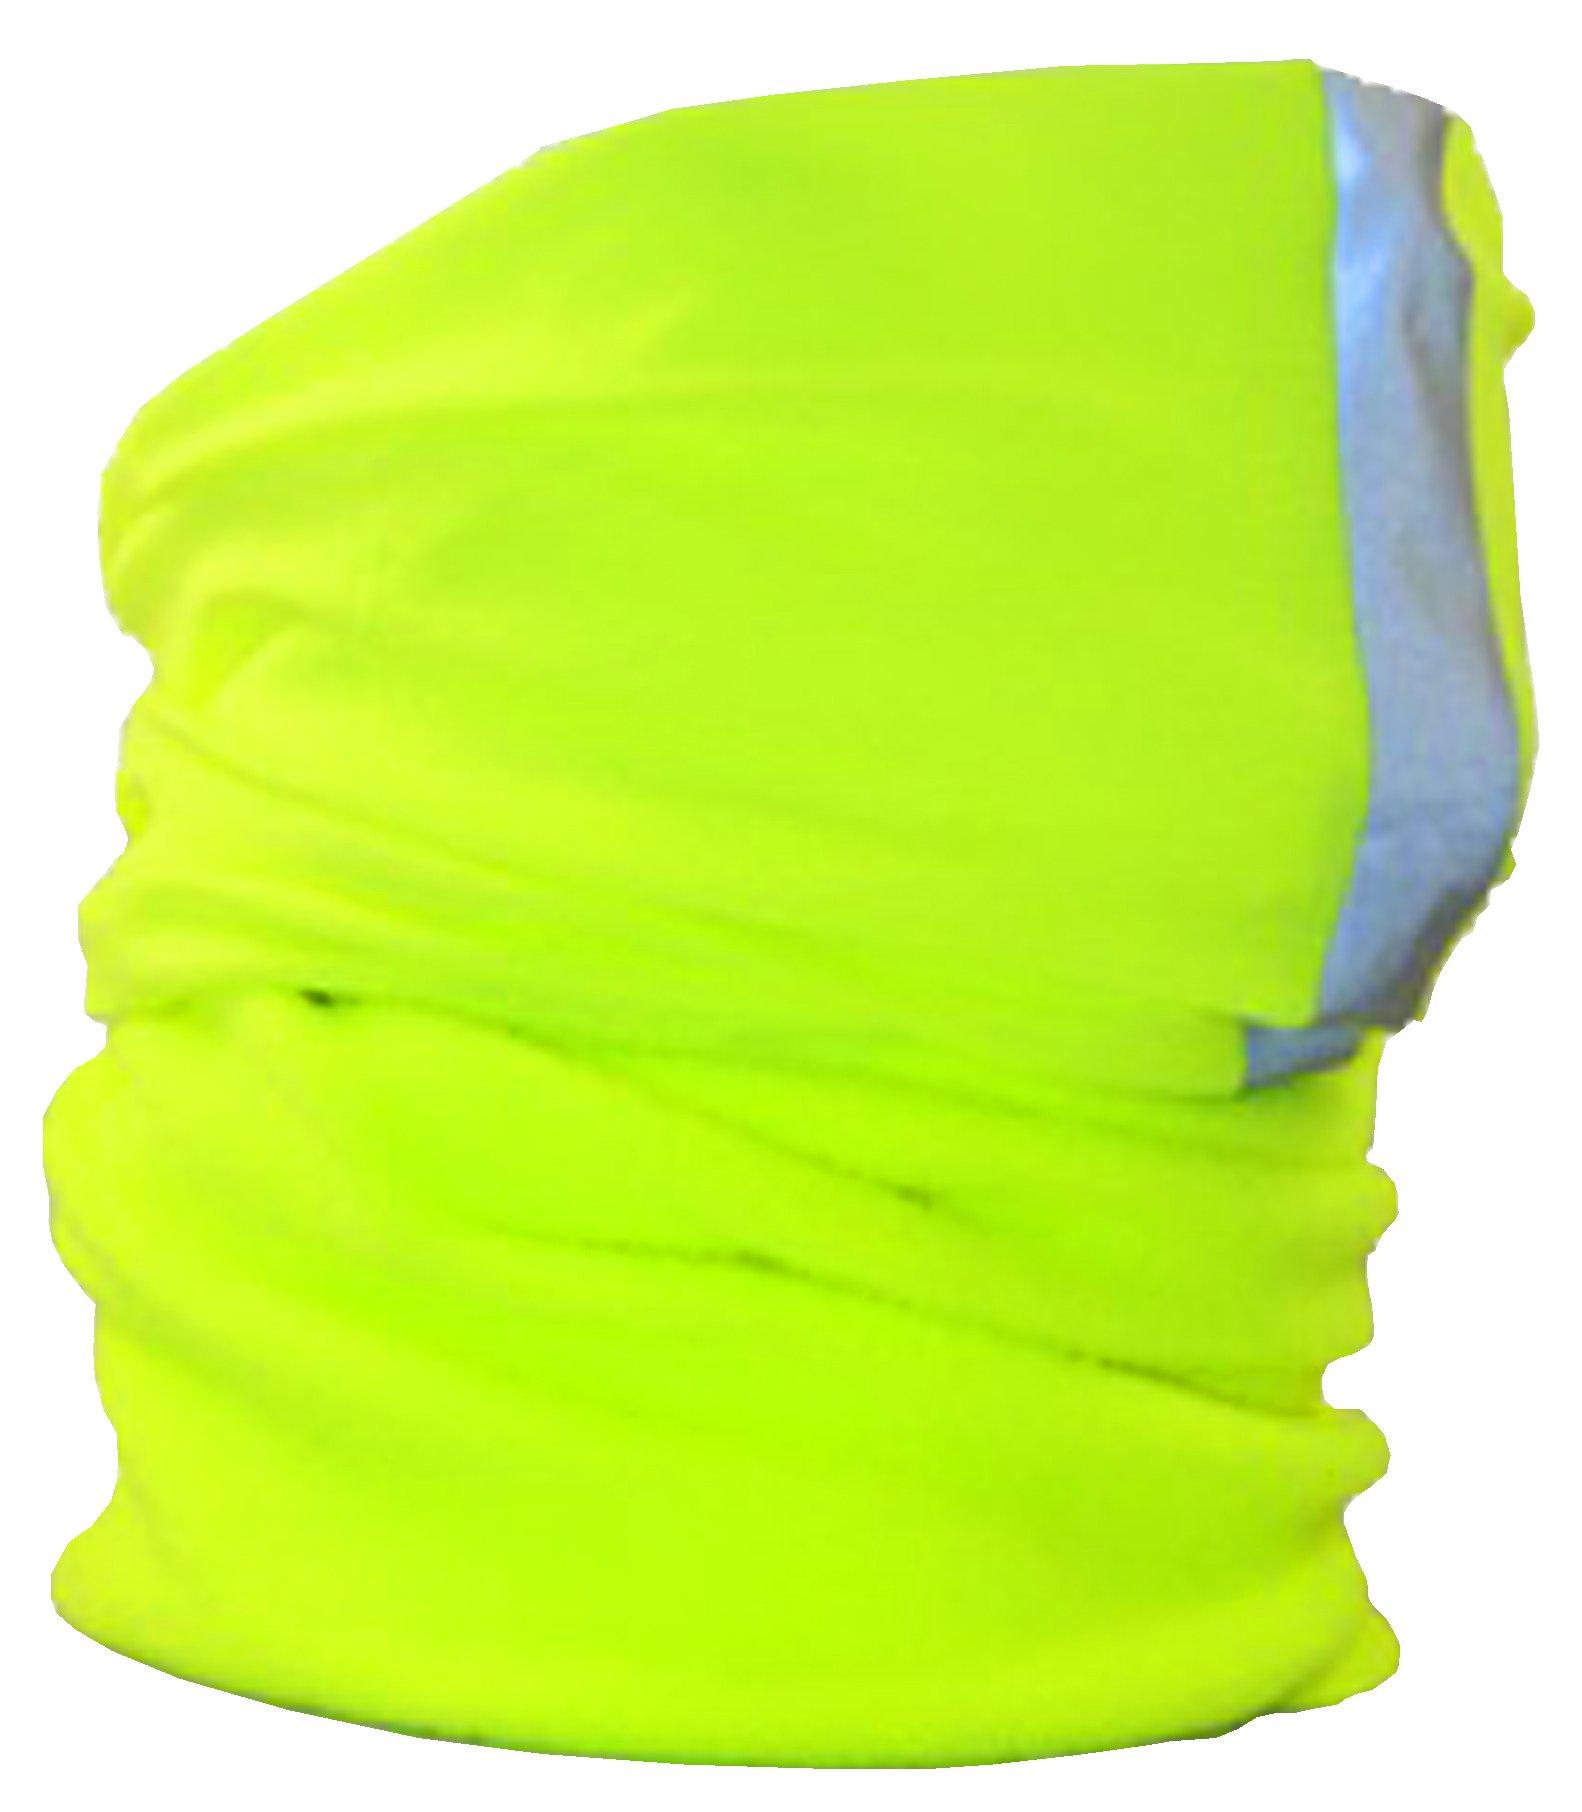 Ladies Womens Yellow Part Fleece Hi Viz Florescent Reflective 3M Scotchlite Striped Multi Function Hair Band Neck Warmer Scarf Headband Balaclava Beanie Head Cap Site Workwear Bike Bicycle